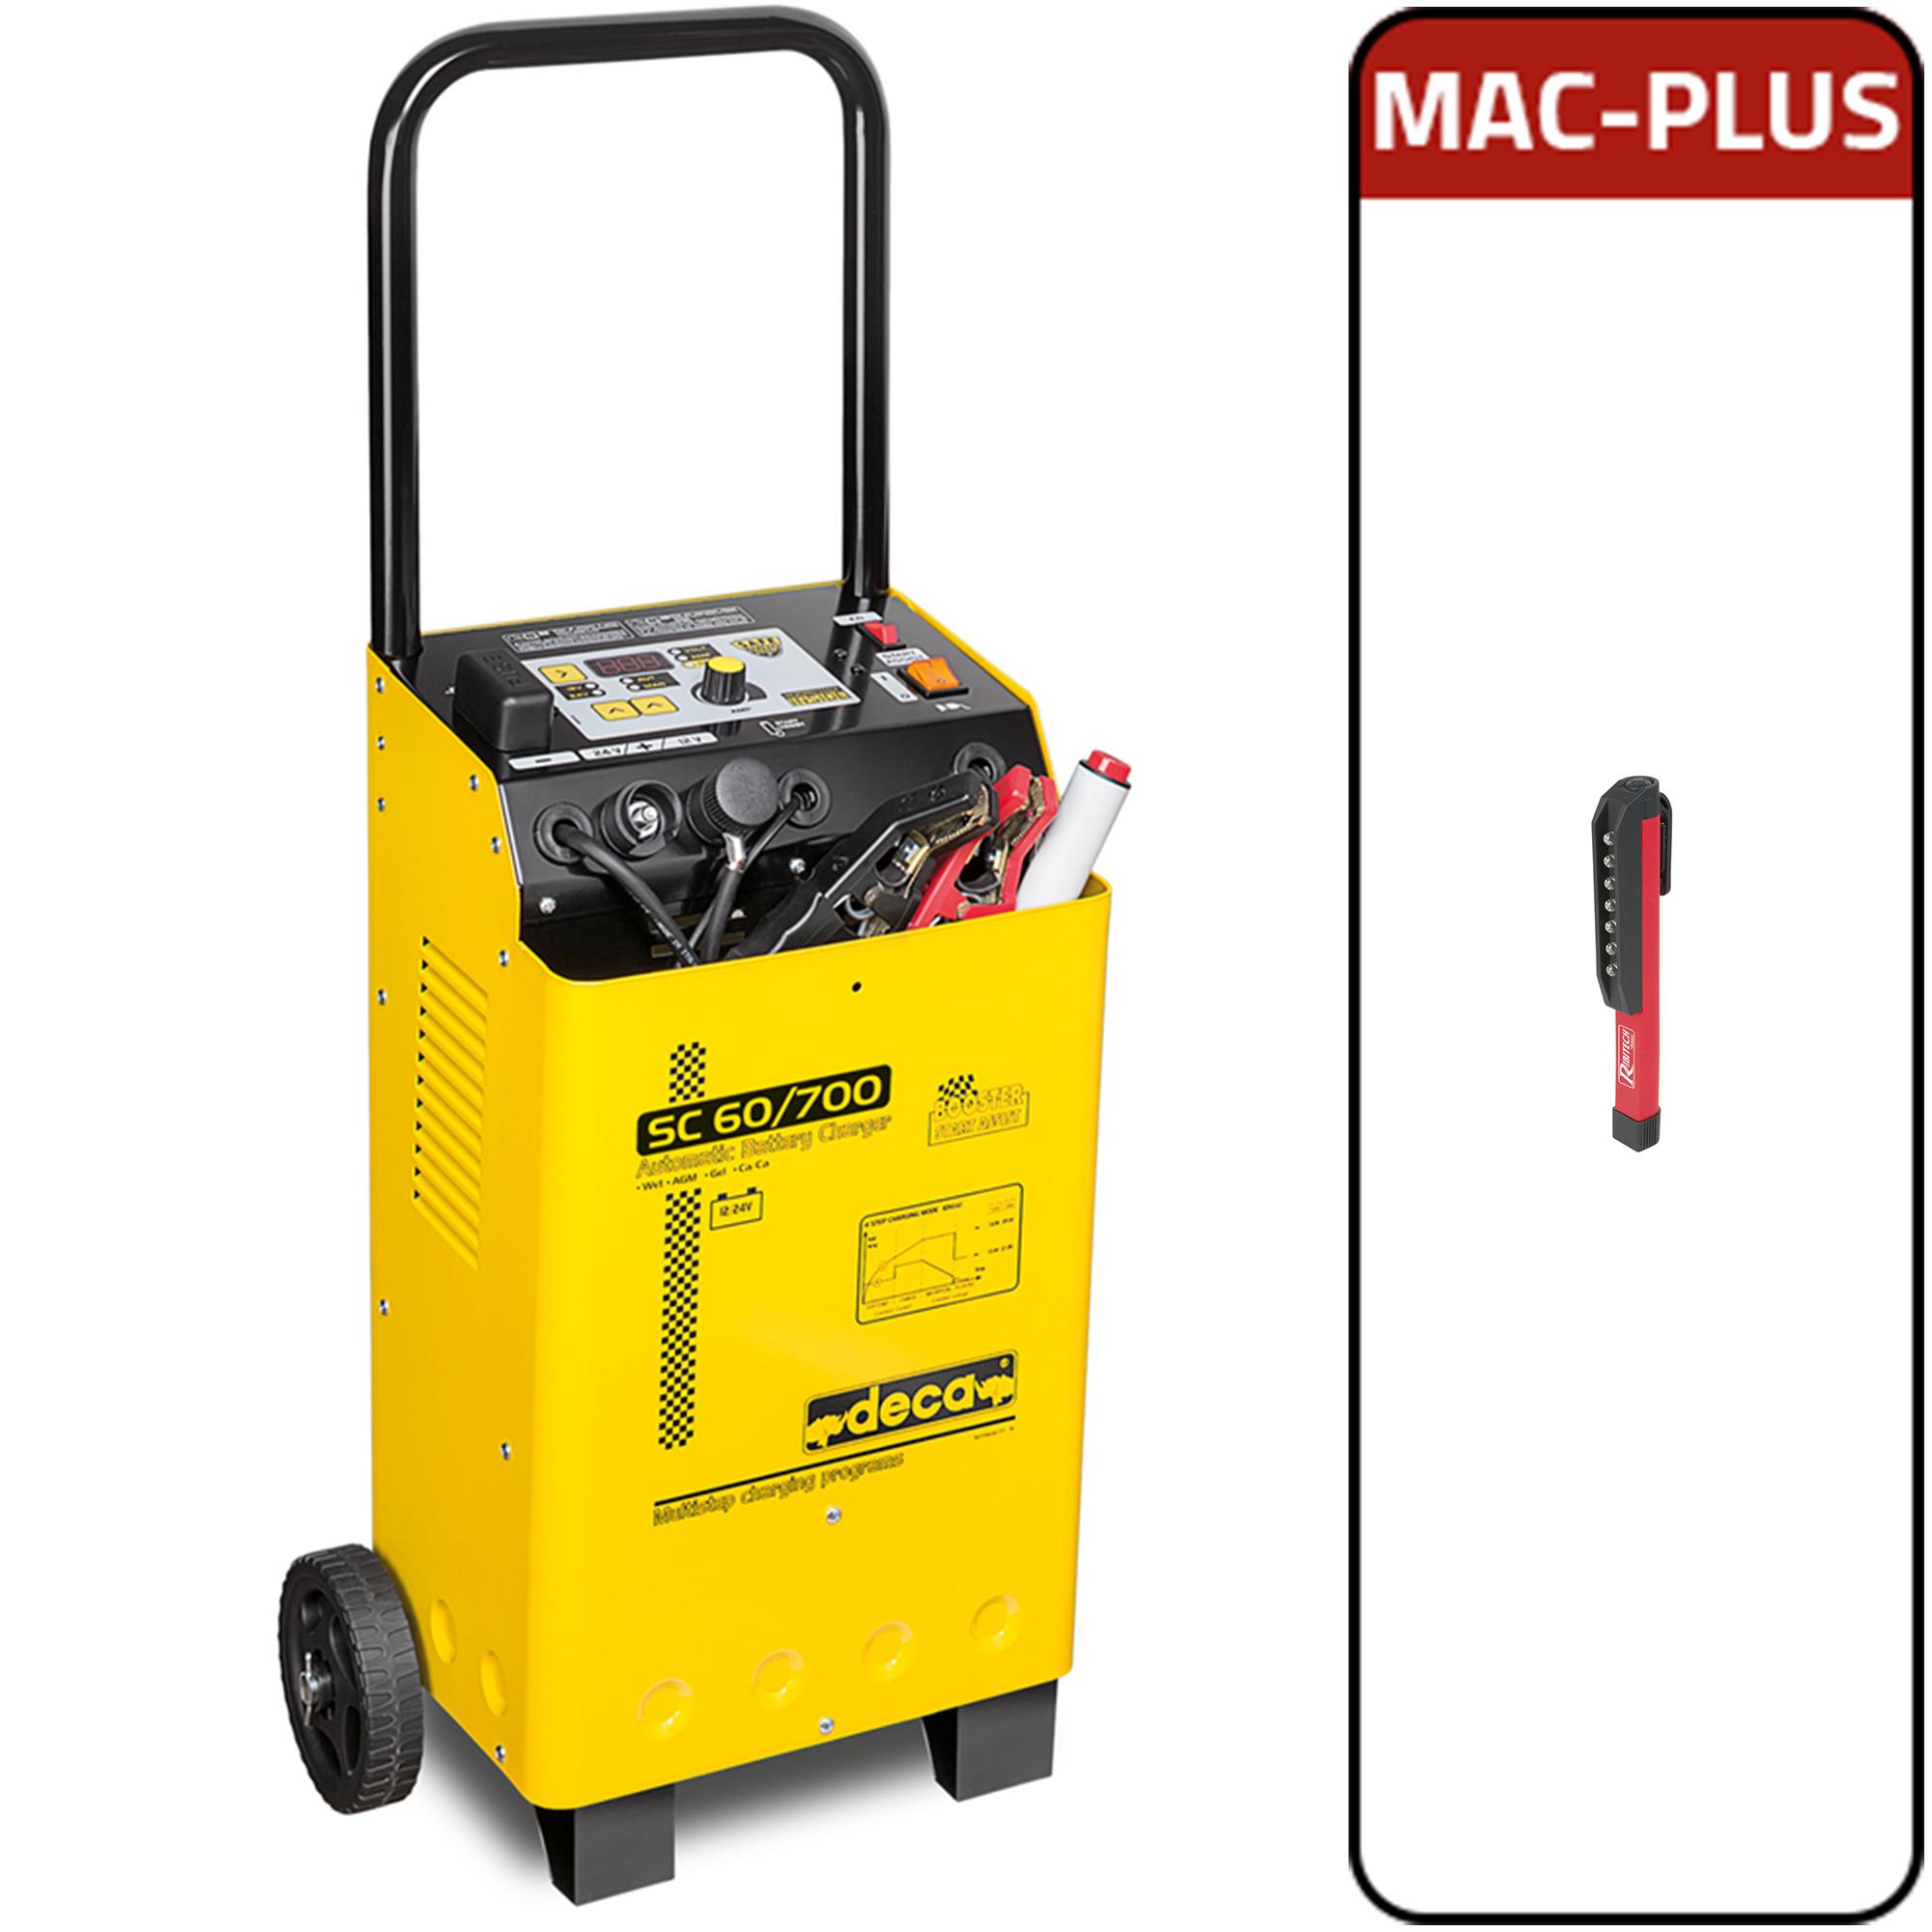 Image of Avviatore caricabatterie mantenitore 12-24V Deca SC 60/700 + MAC - PLUS